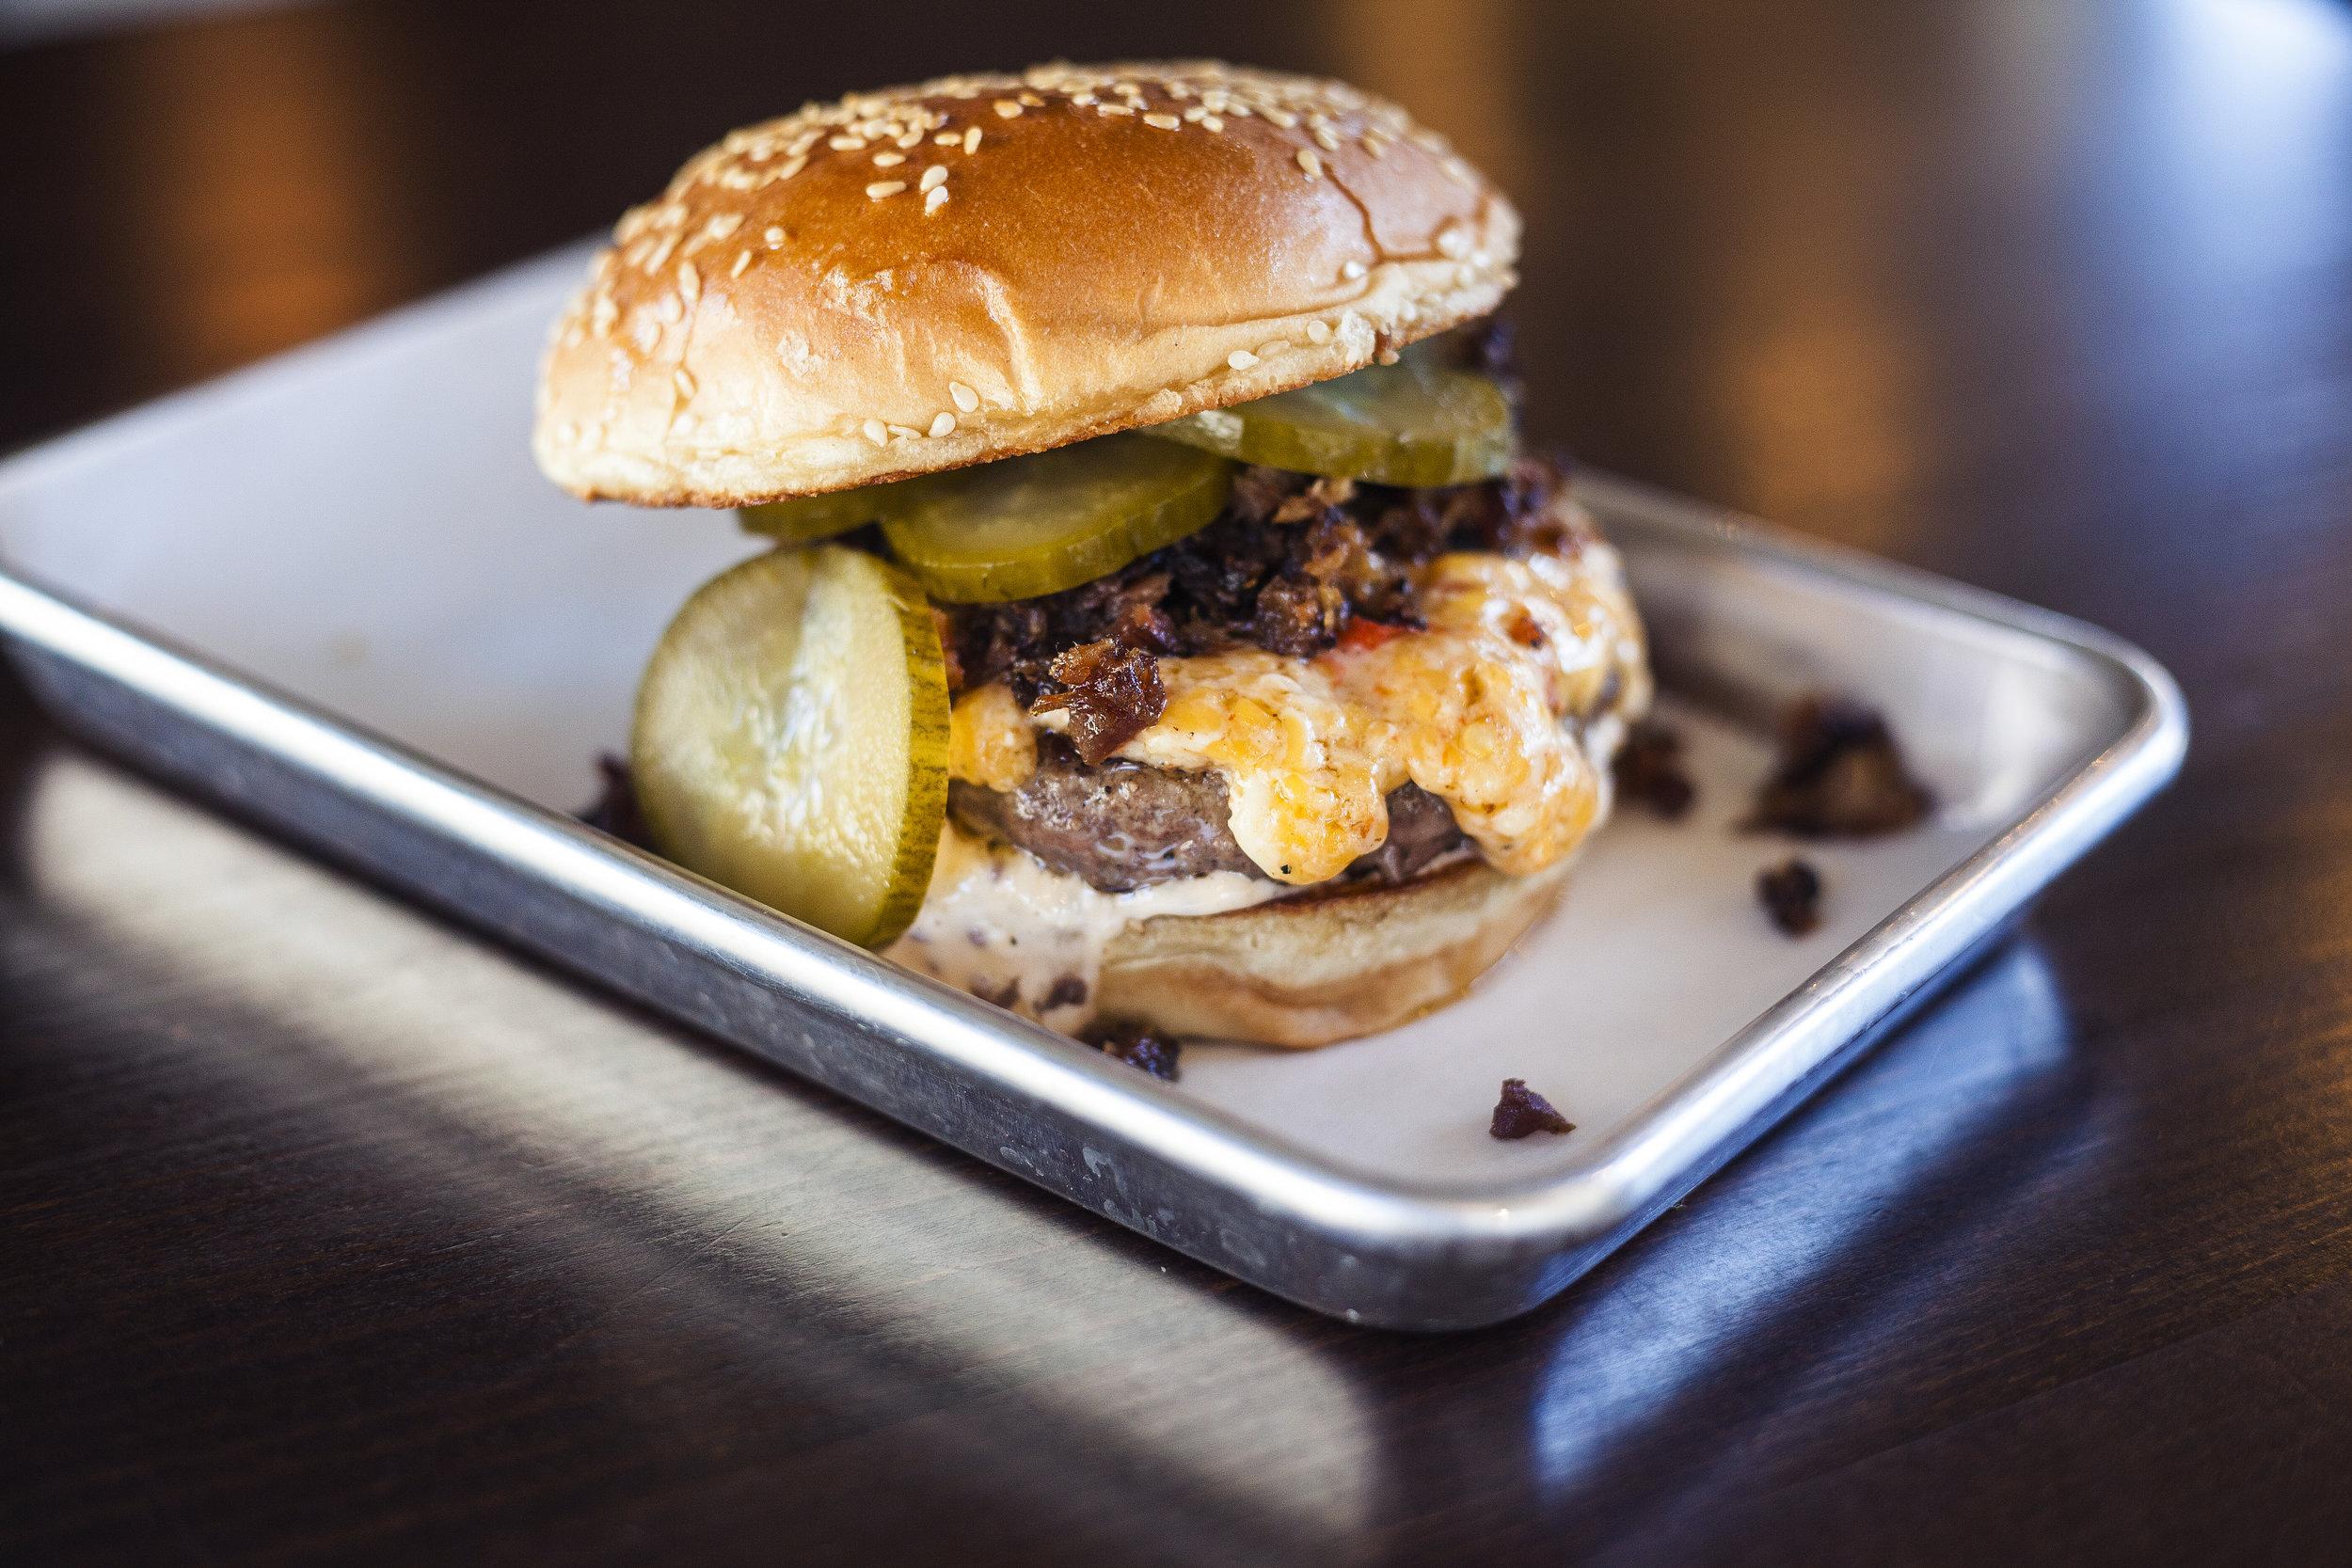 hamburger with pickles